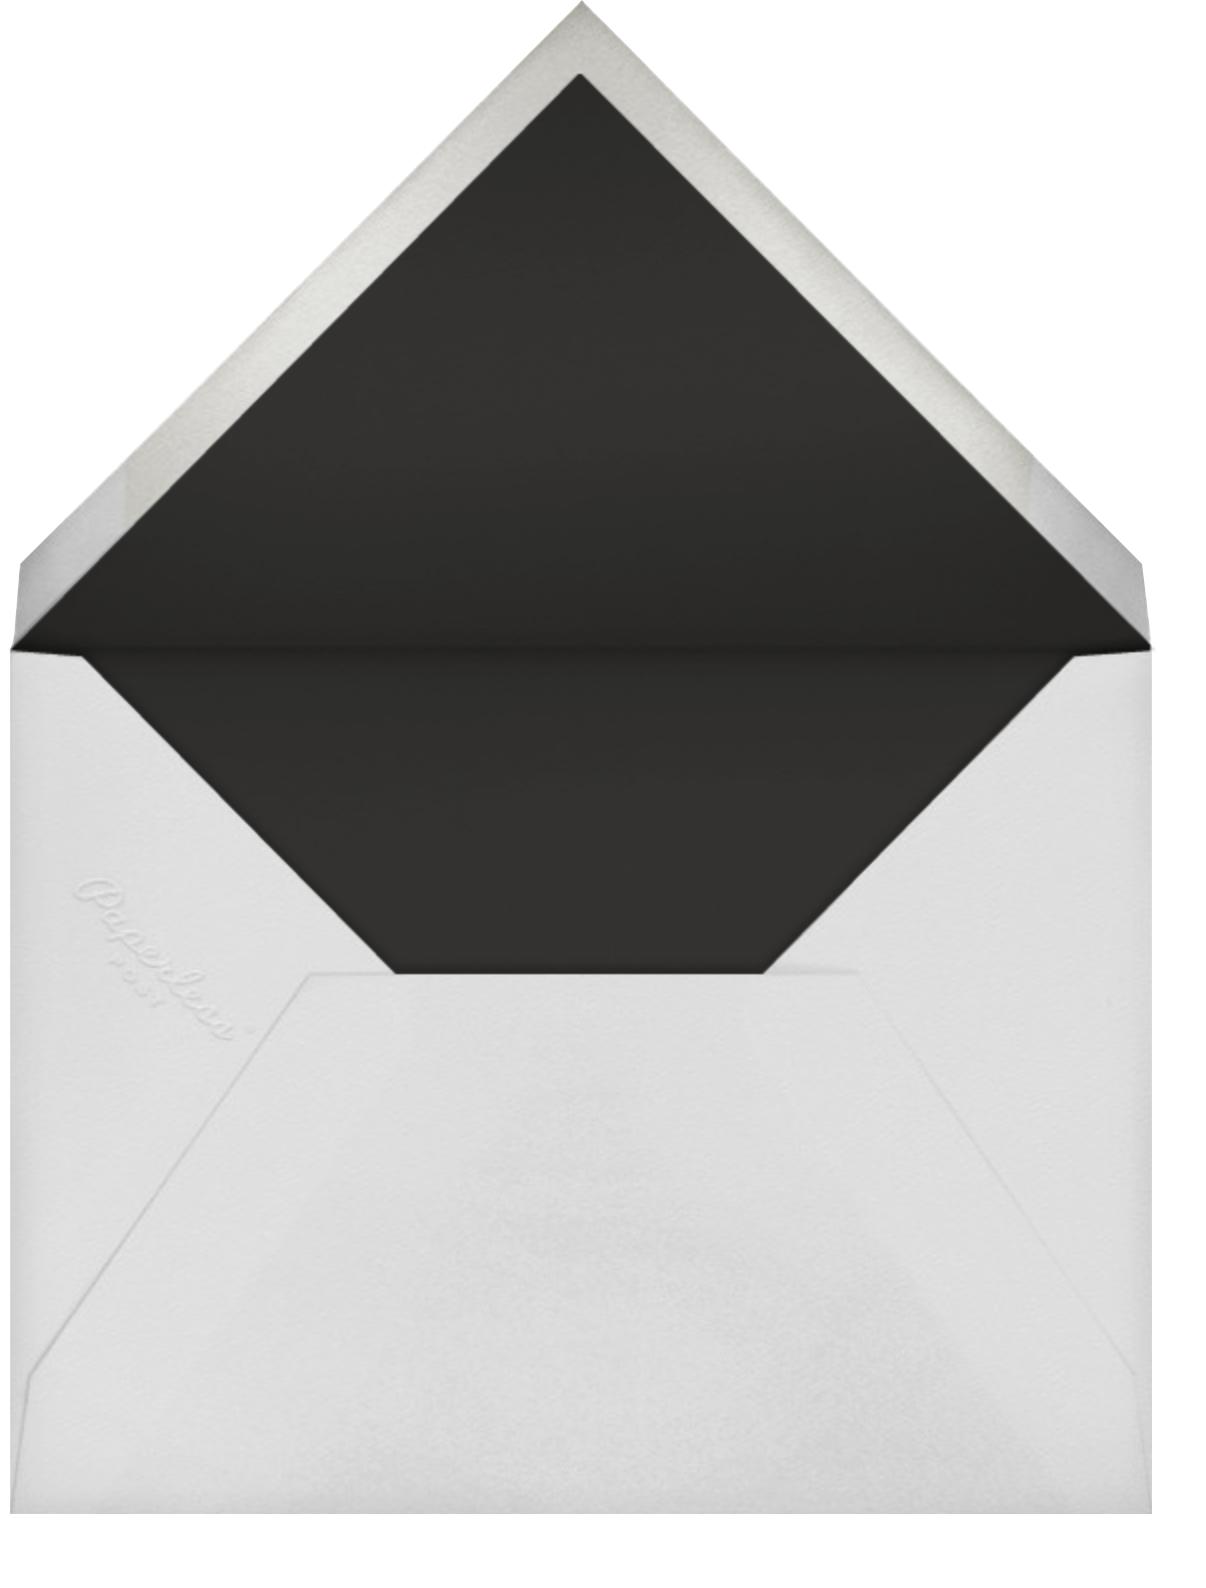 Firth - Black - Vera Wang - Anniversary party - envelope back